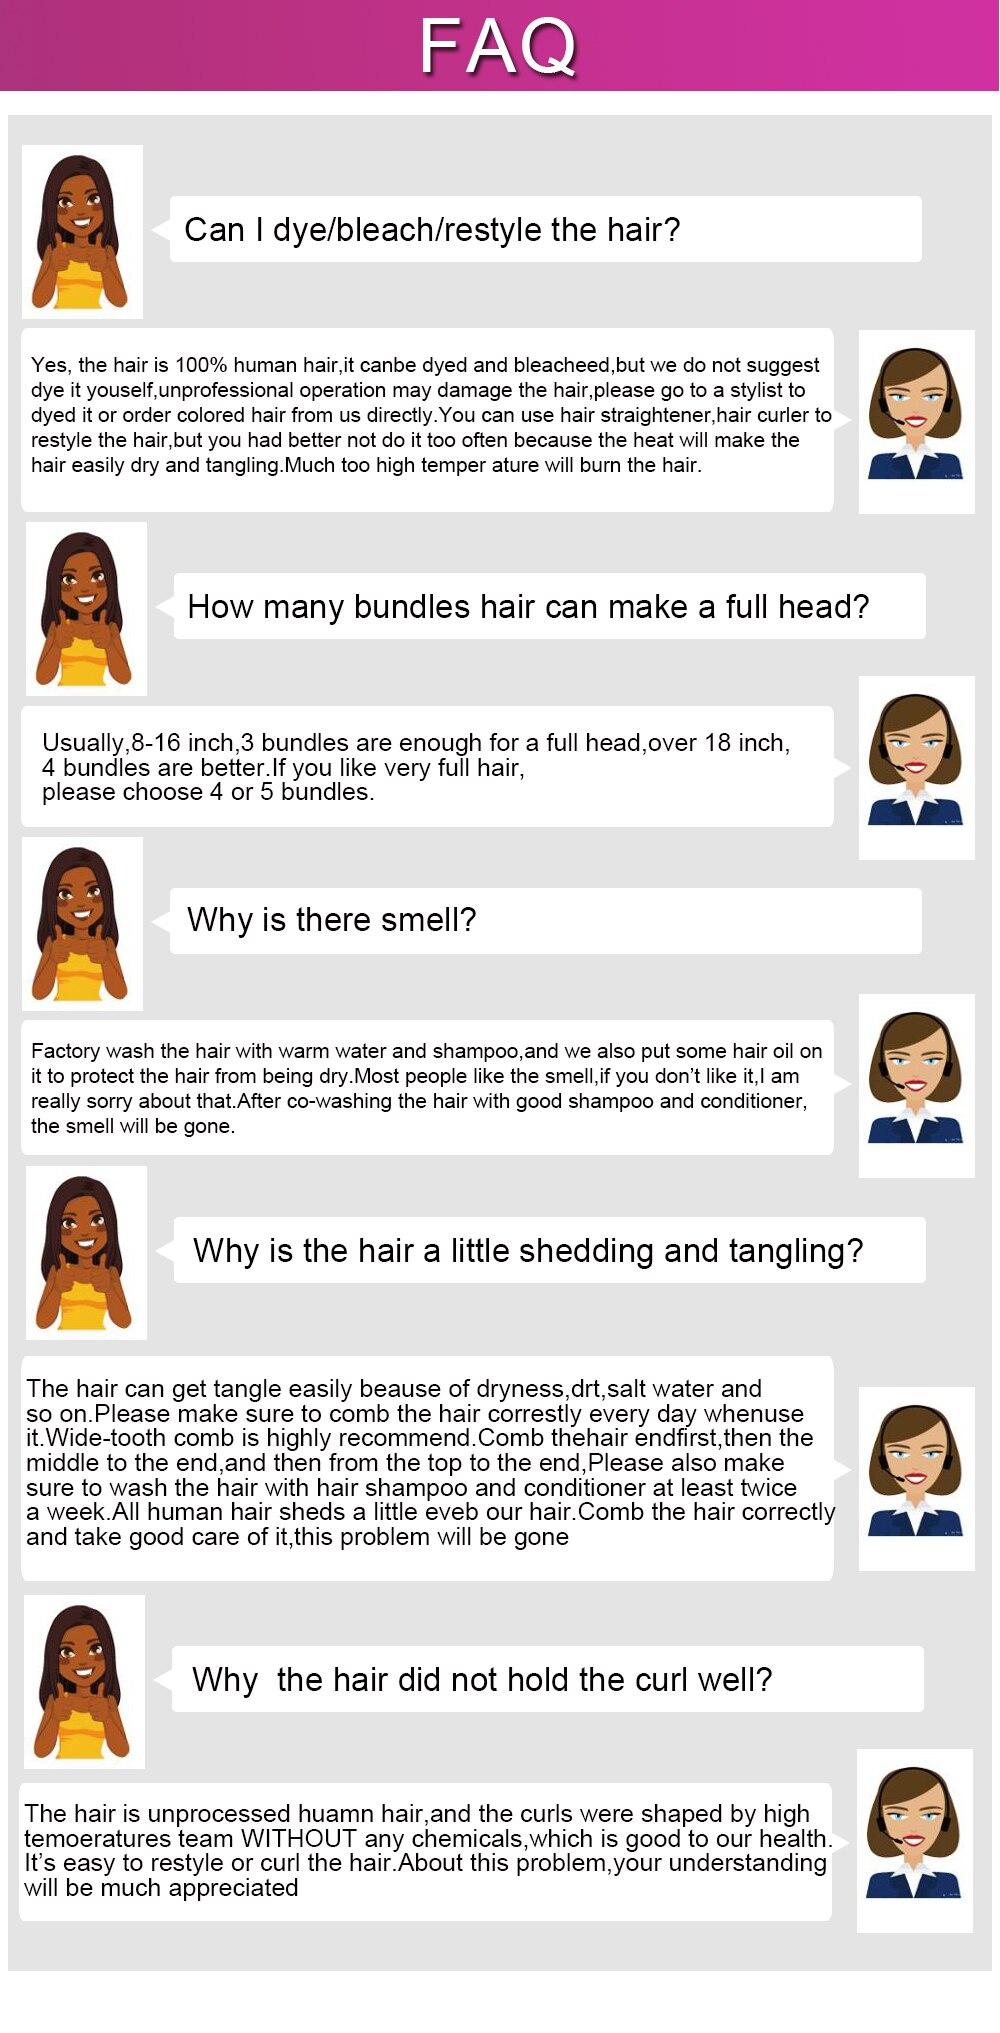 HTB1I8I3bBOD3KVjSZFFq6An9pXaK UEENLY Loose Wave Bundles With Closure Remy Human Hair Bundles With Closure Brazilian Hair Wave 3 Bundles With 4*4 Closure